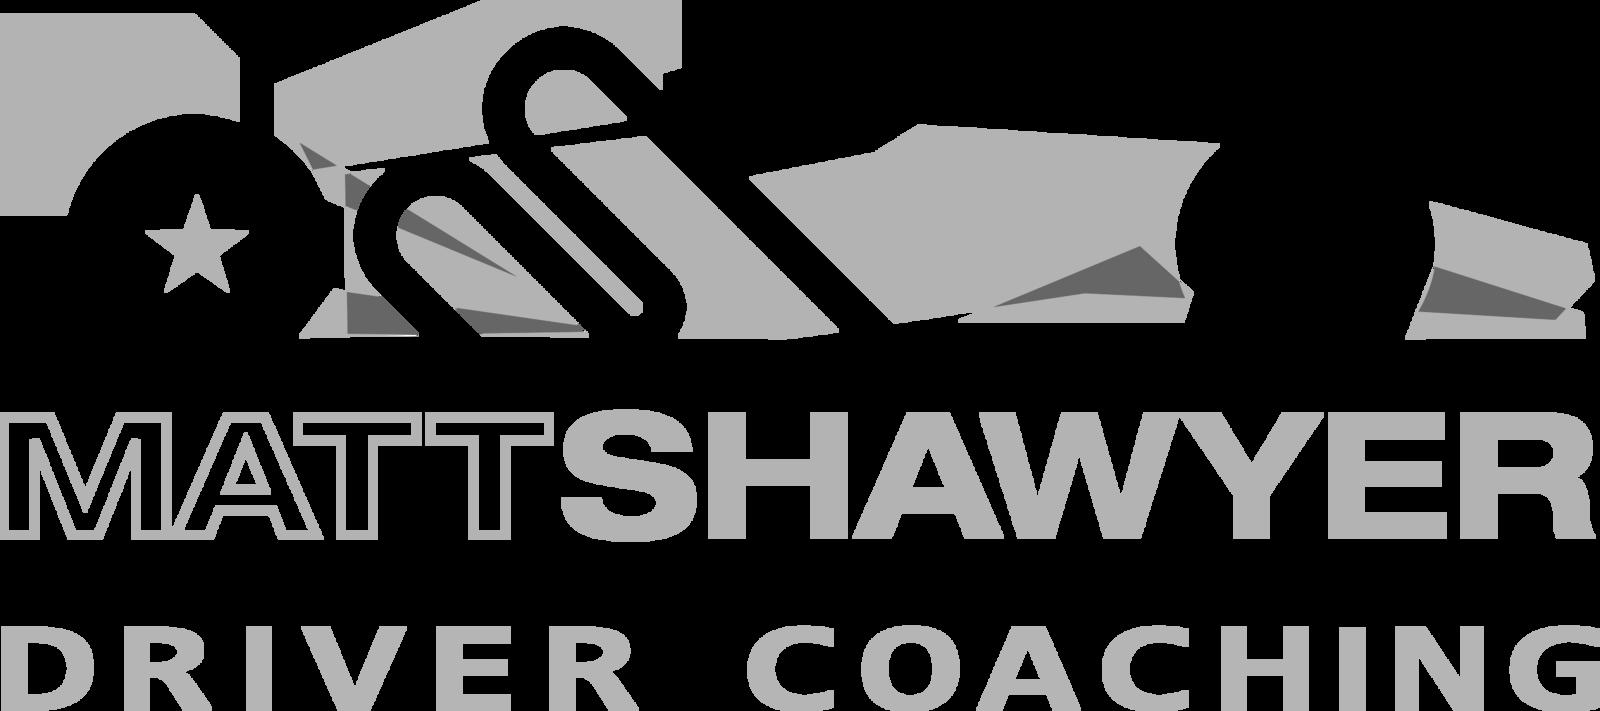 MattShawyer_DriverCoaching.png